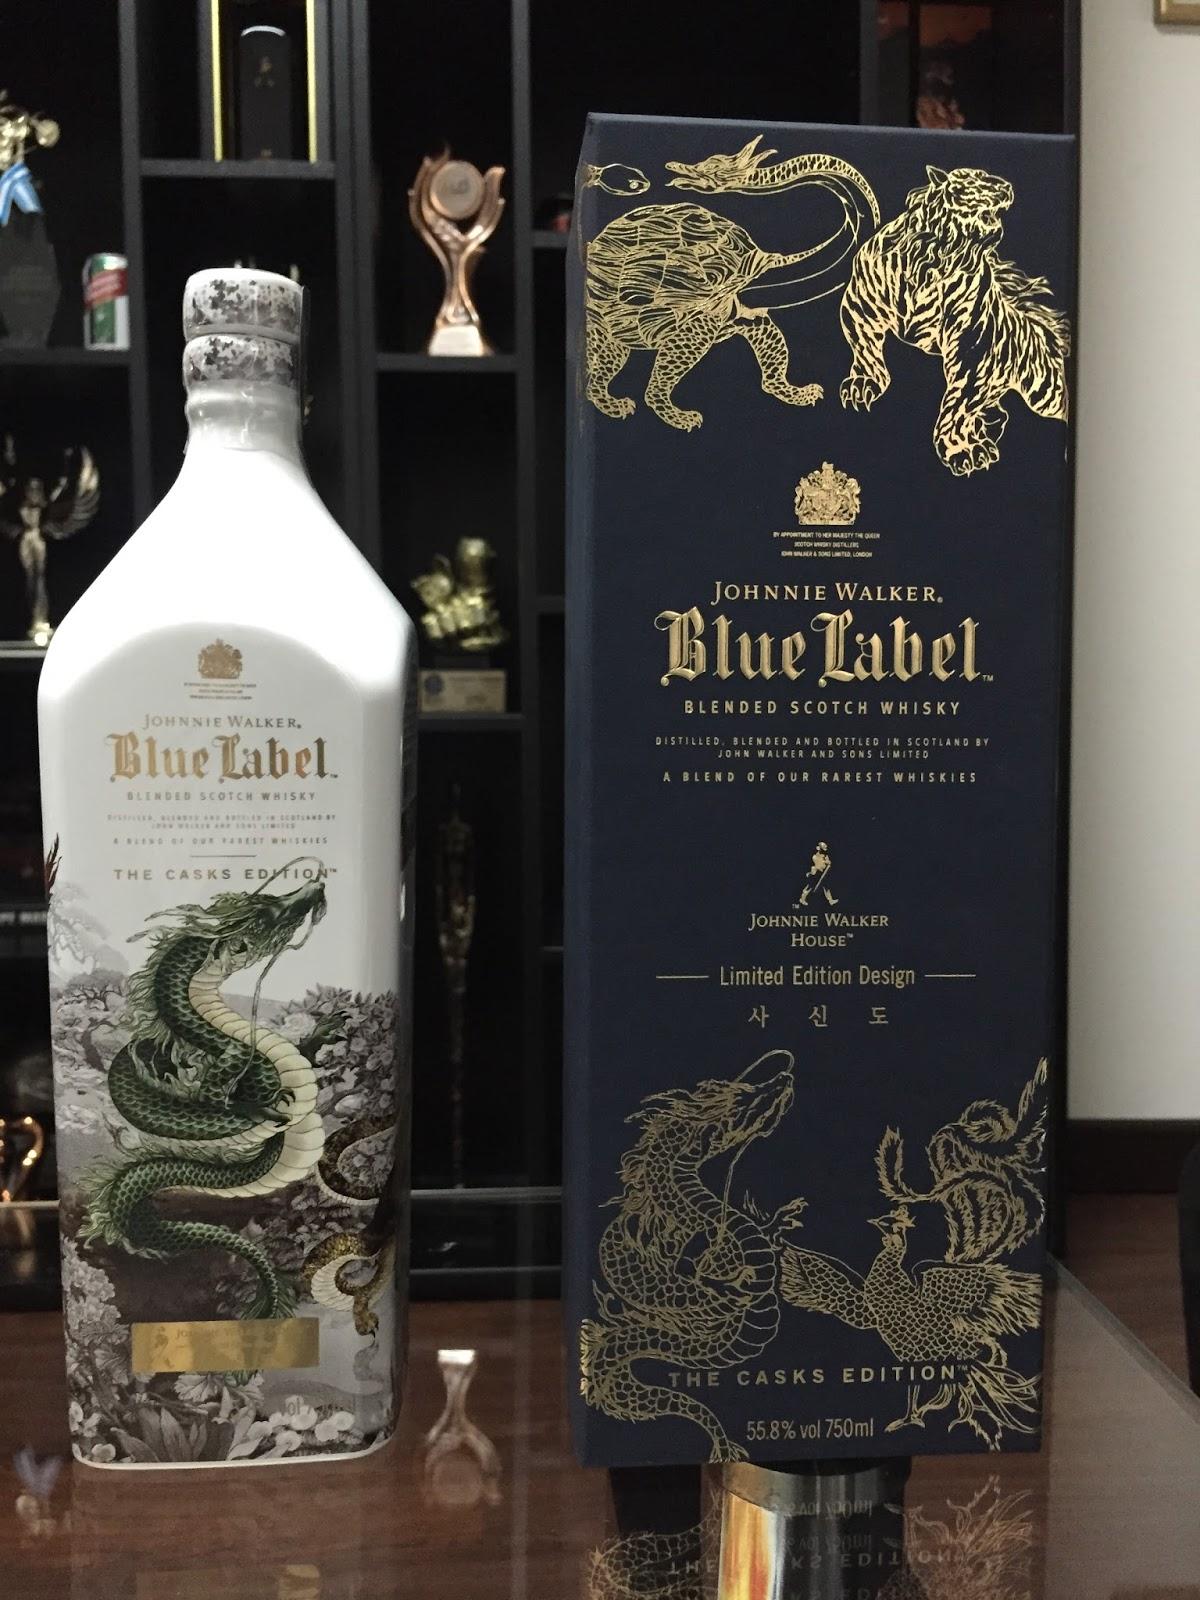 johnnie walker bottles history and evolution blue label limited edition